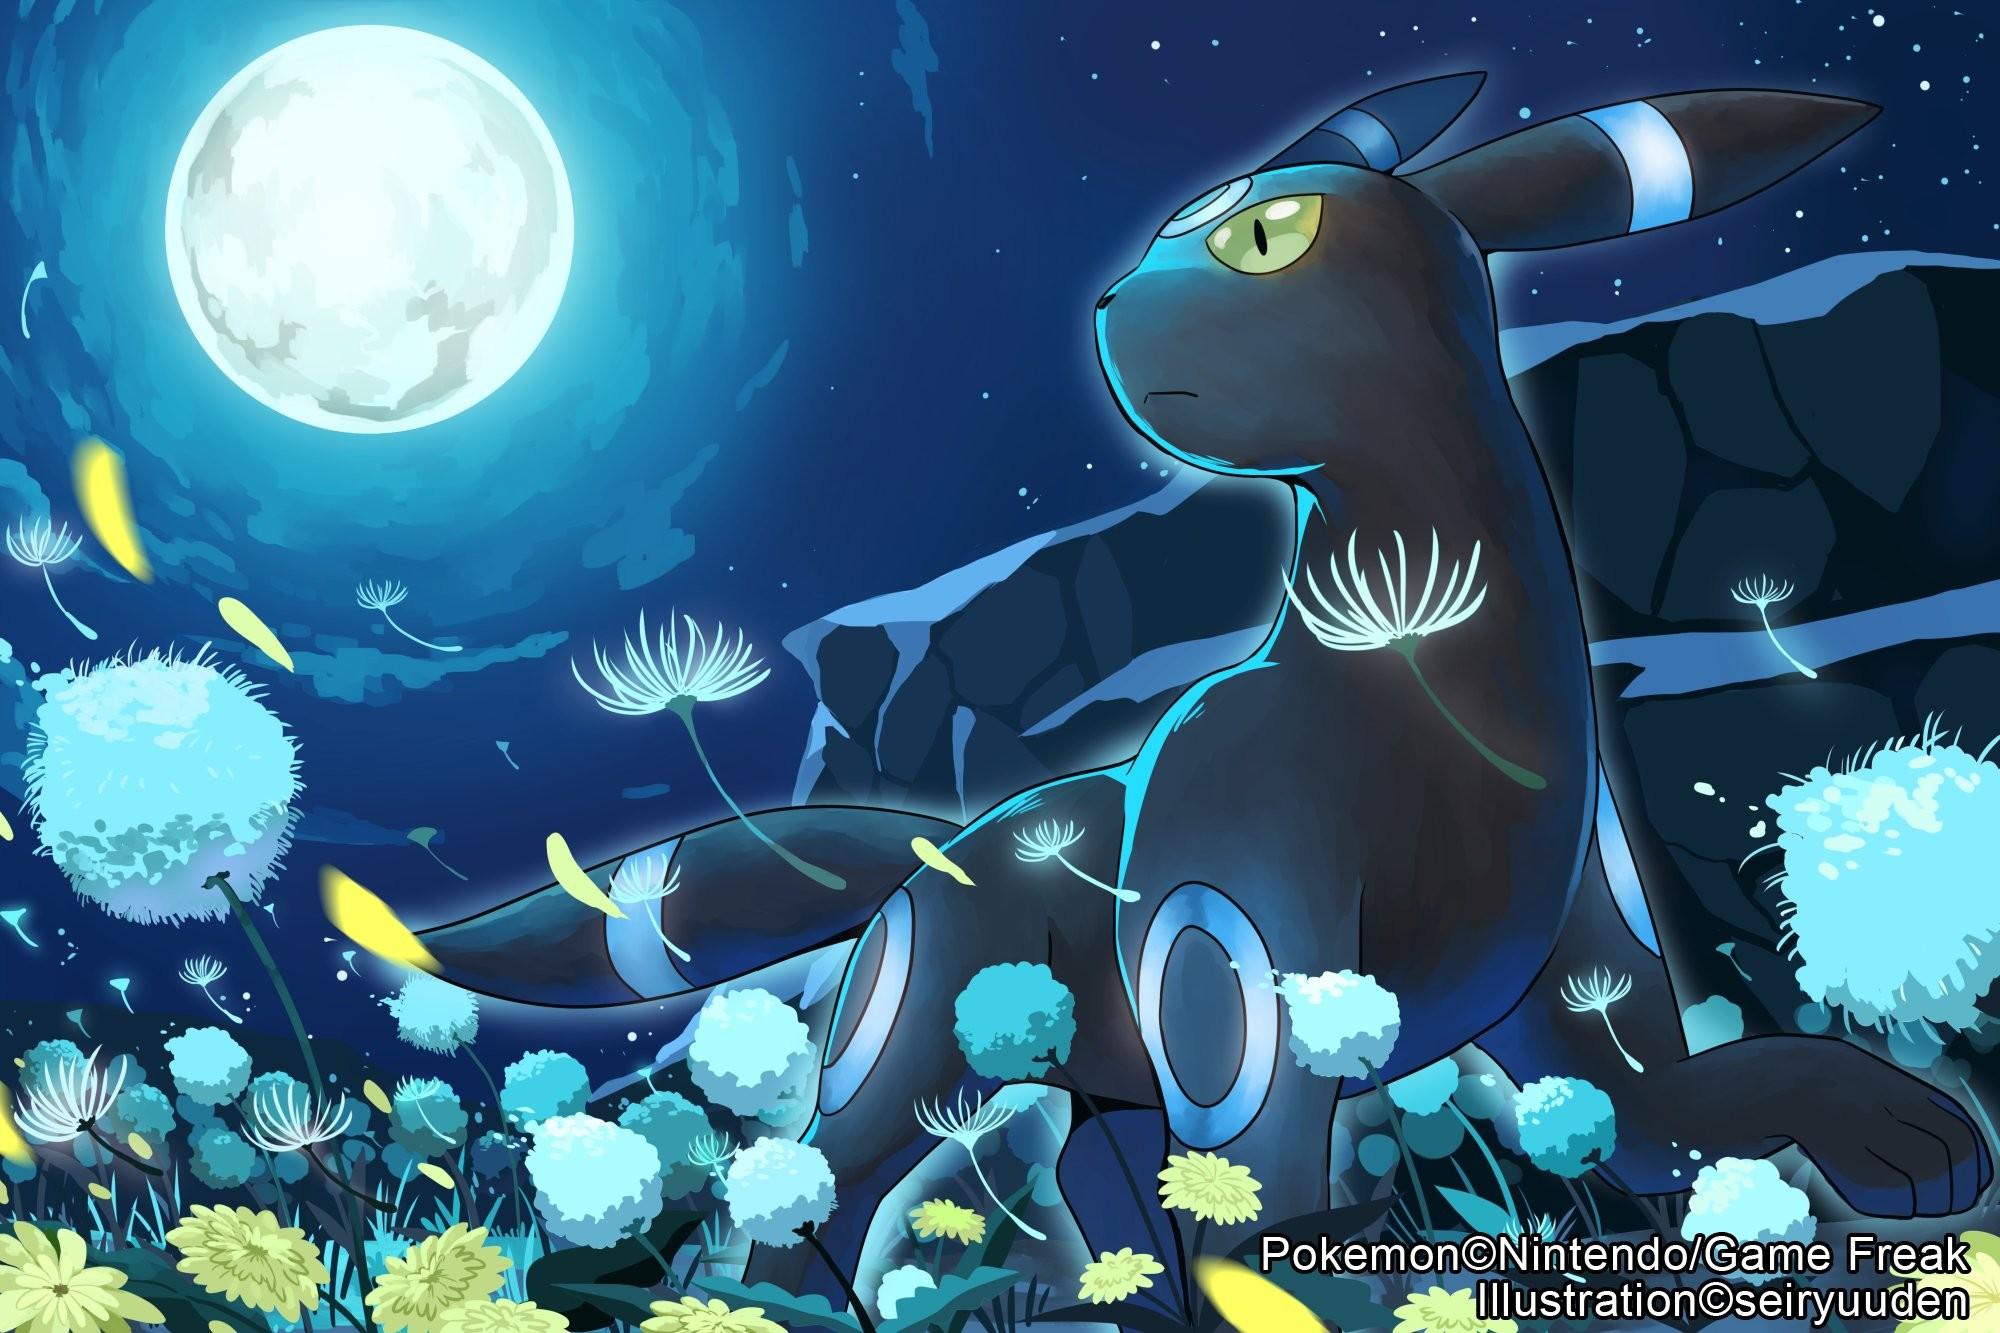 Pokemon Umbreon g wallpaper | | 340952 | WallpaperUP